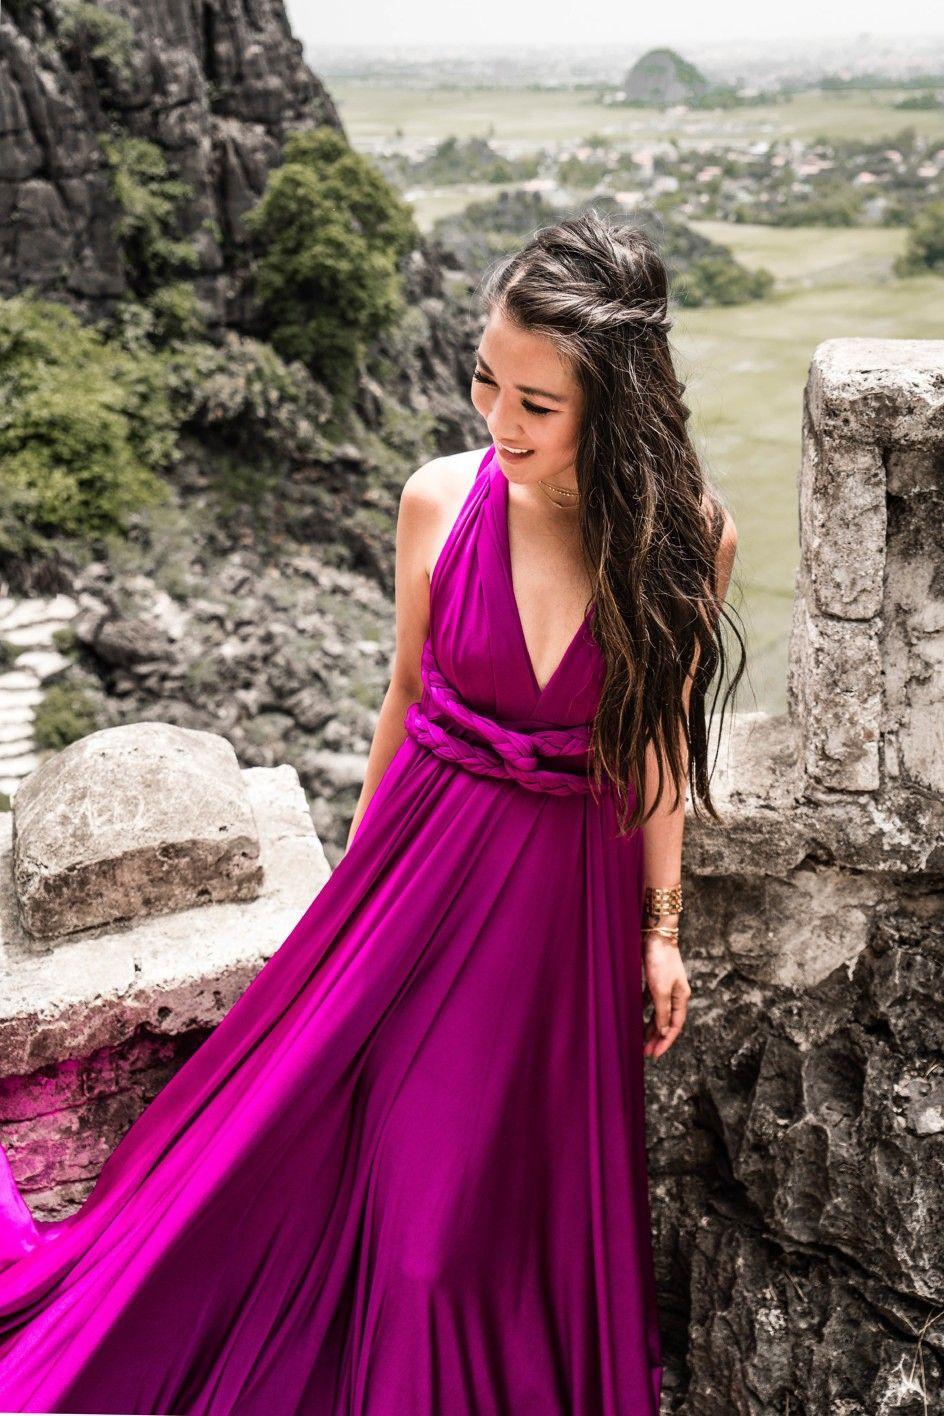 Another World In Ninh Binh Maxi Dress Braided Details Wendy S Lookbook Dresses Dainty Dress Maxi Dress Formal [ 1416 x 944 Pixel ]